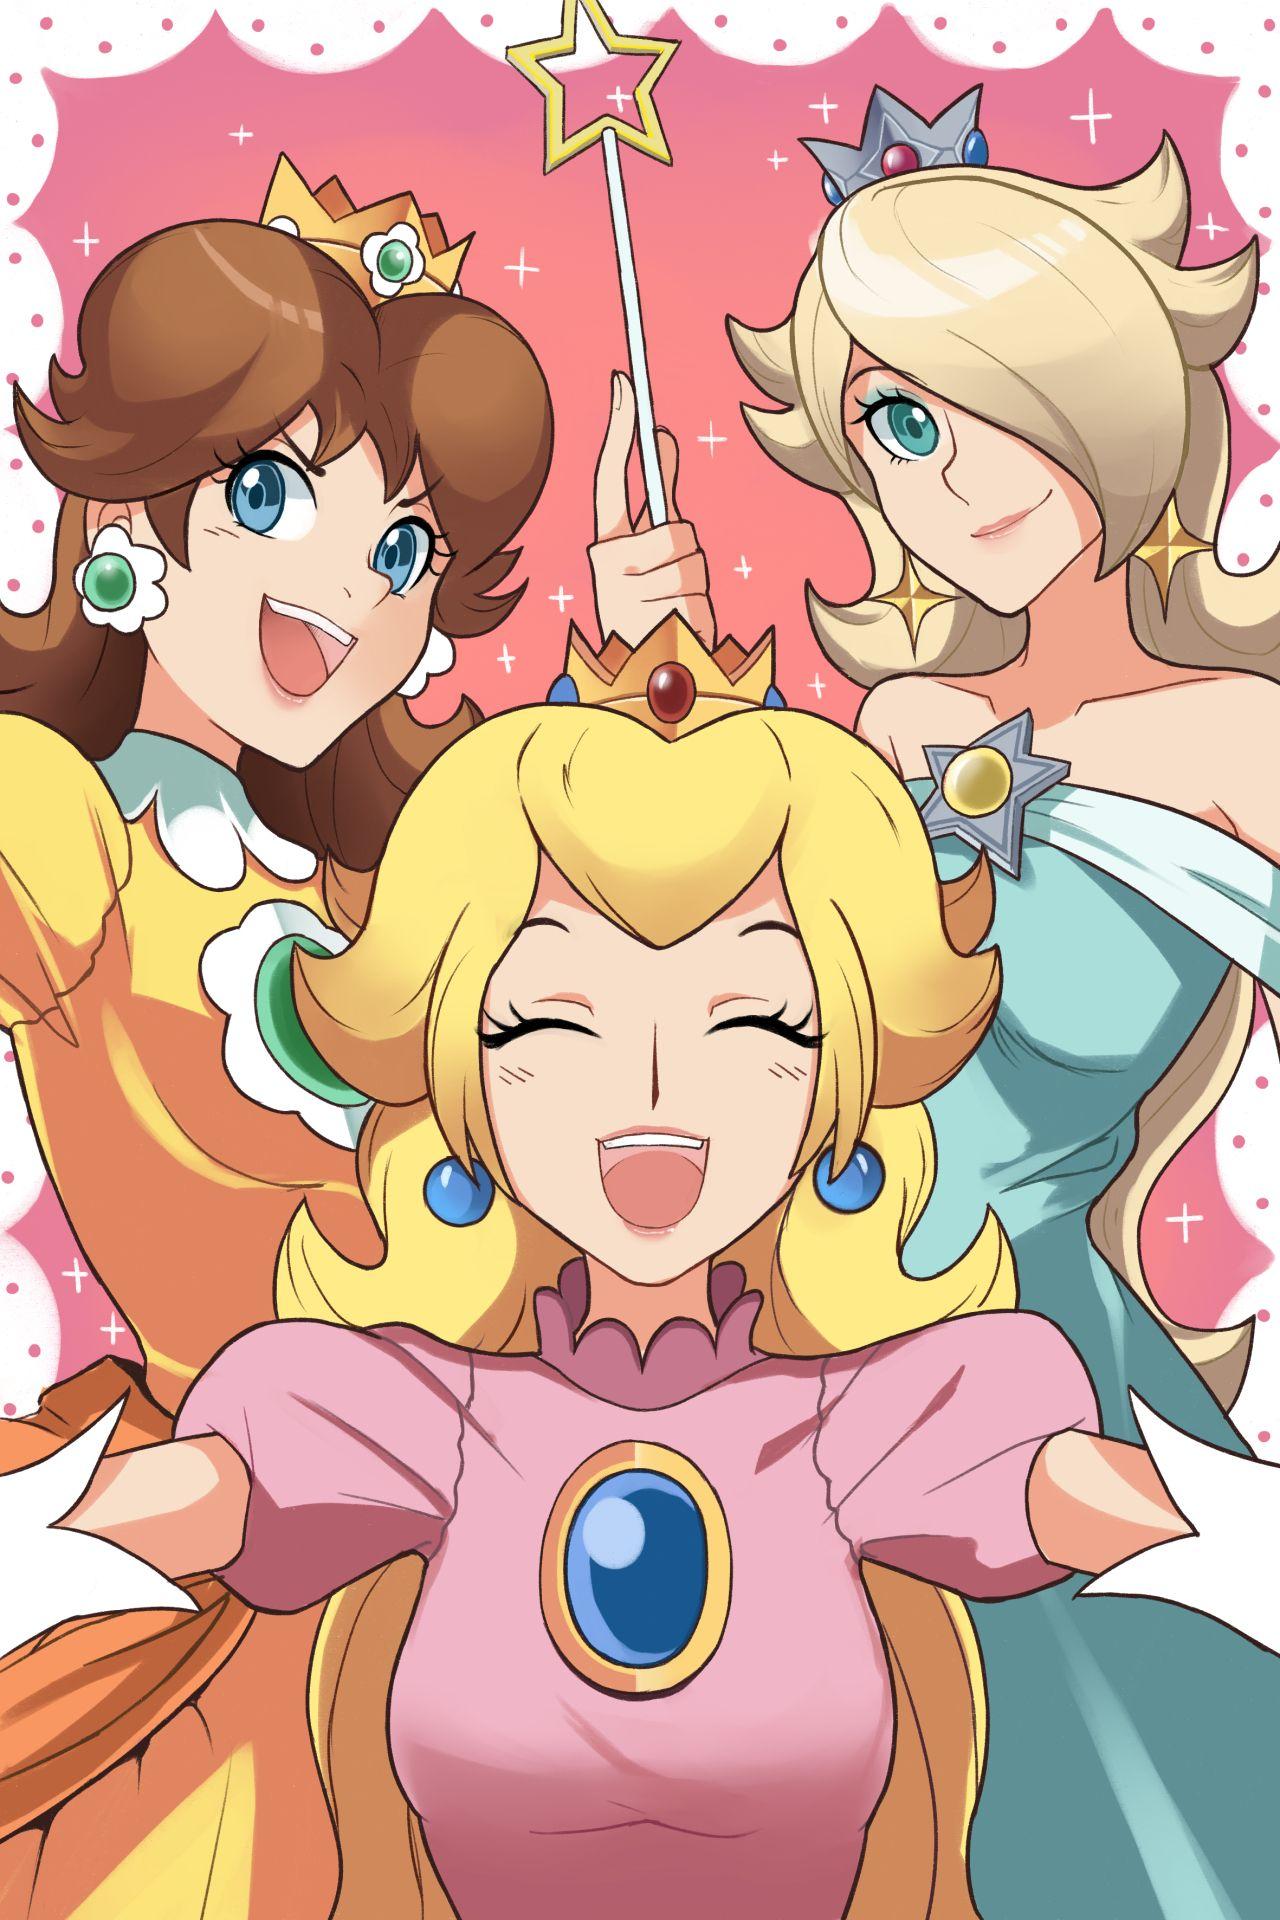 Super Mario Bros 1786474 Zerochan Super Mario Art Mario Bros Princess Daisy